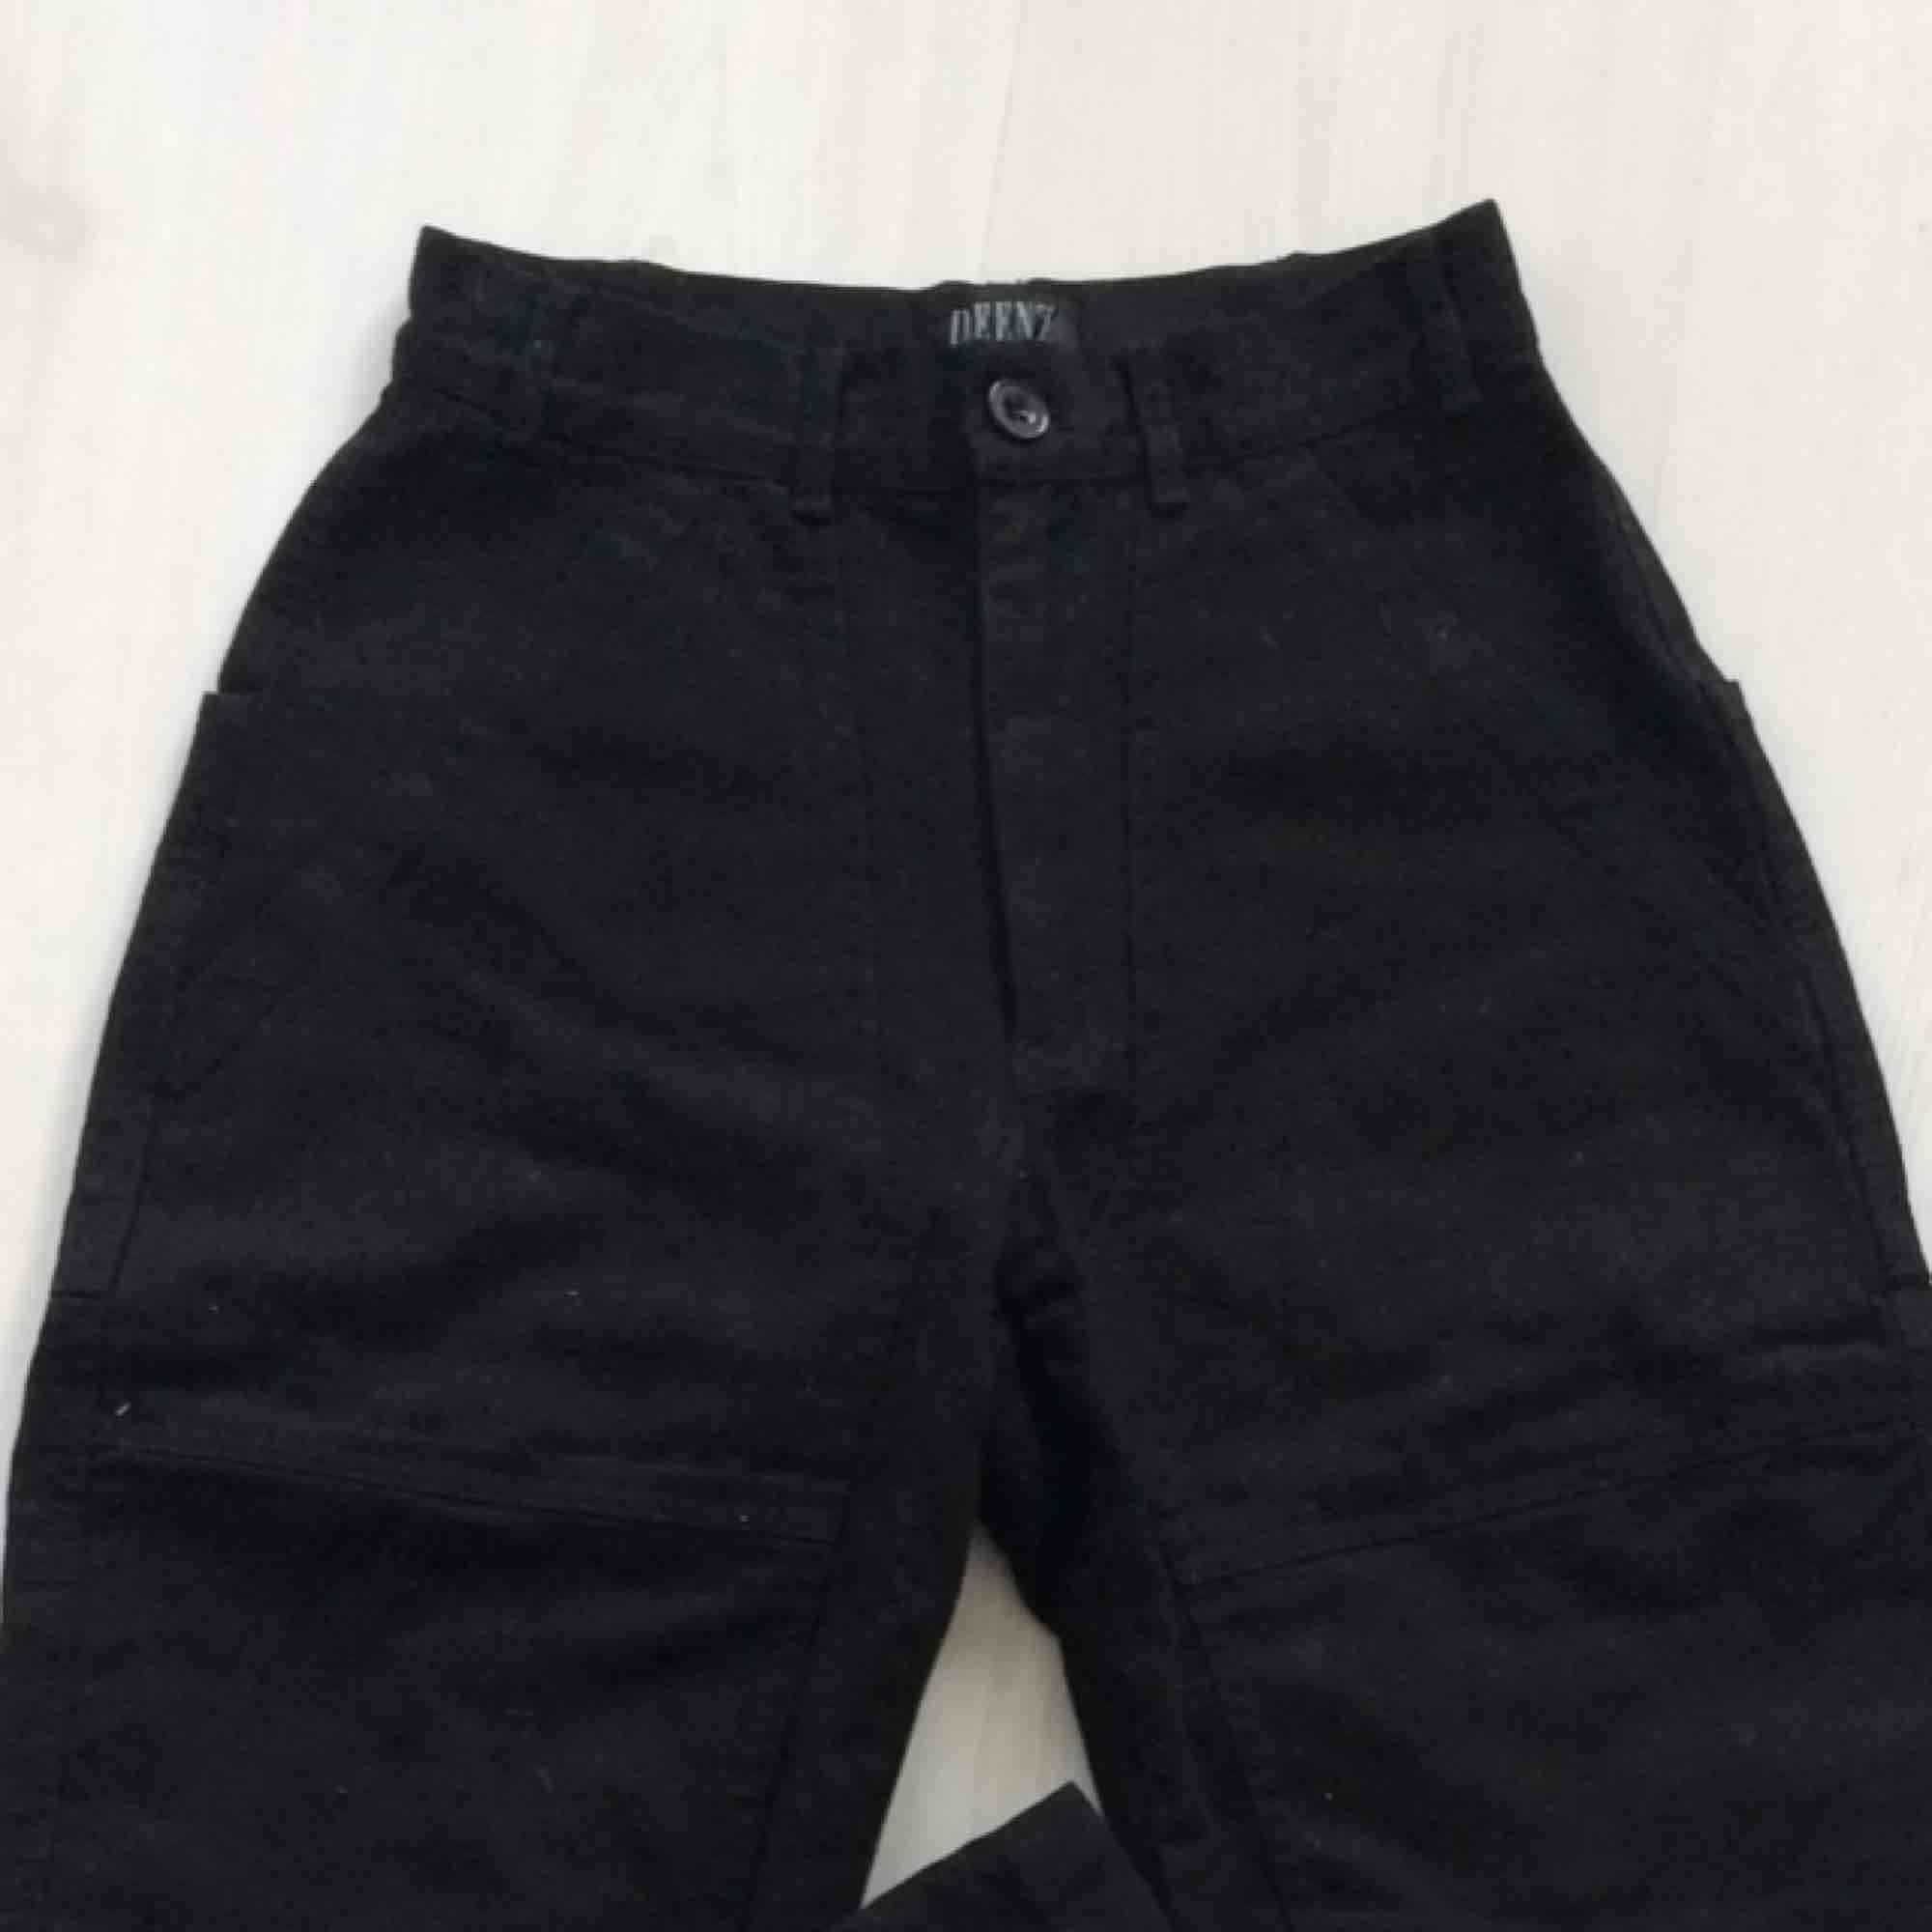 Coola utility trousers/workwear style! Svarta i grovt tyg, typ denimaktigt. Skitsnygga på! Hämtas i Malmö eller fraktar för 50kr💕. Jeans & Byxor.